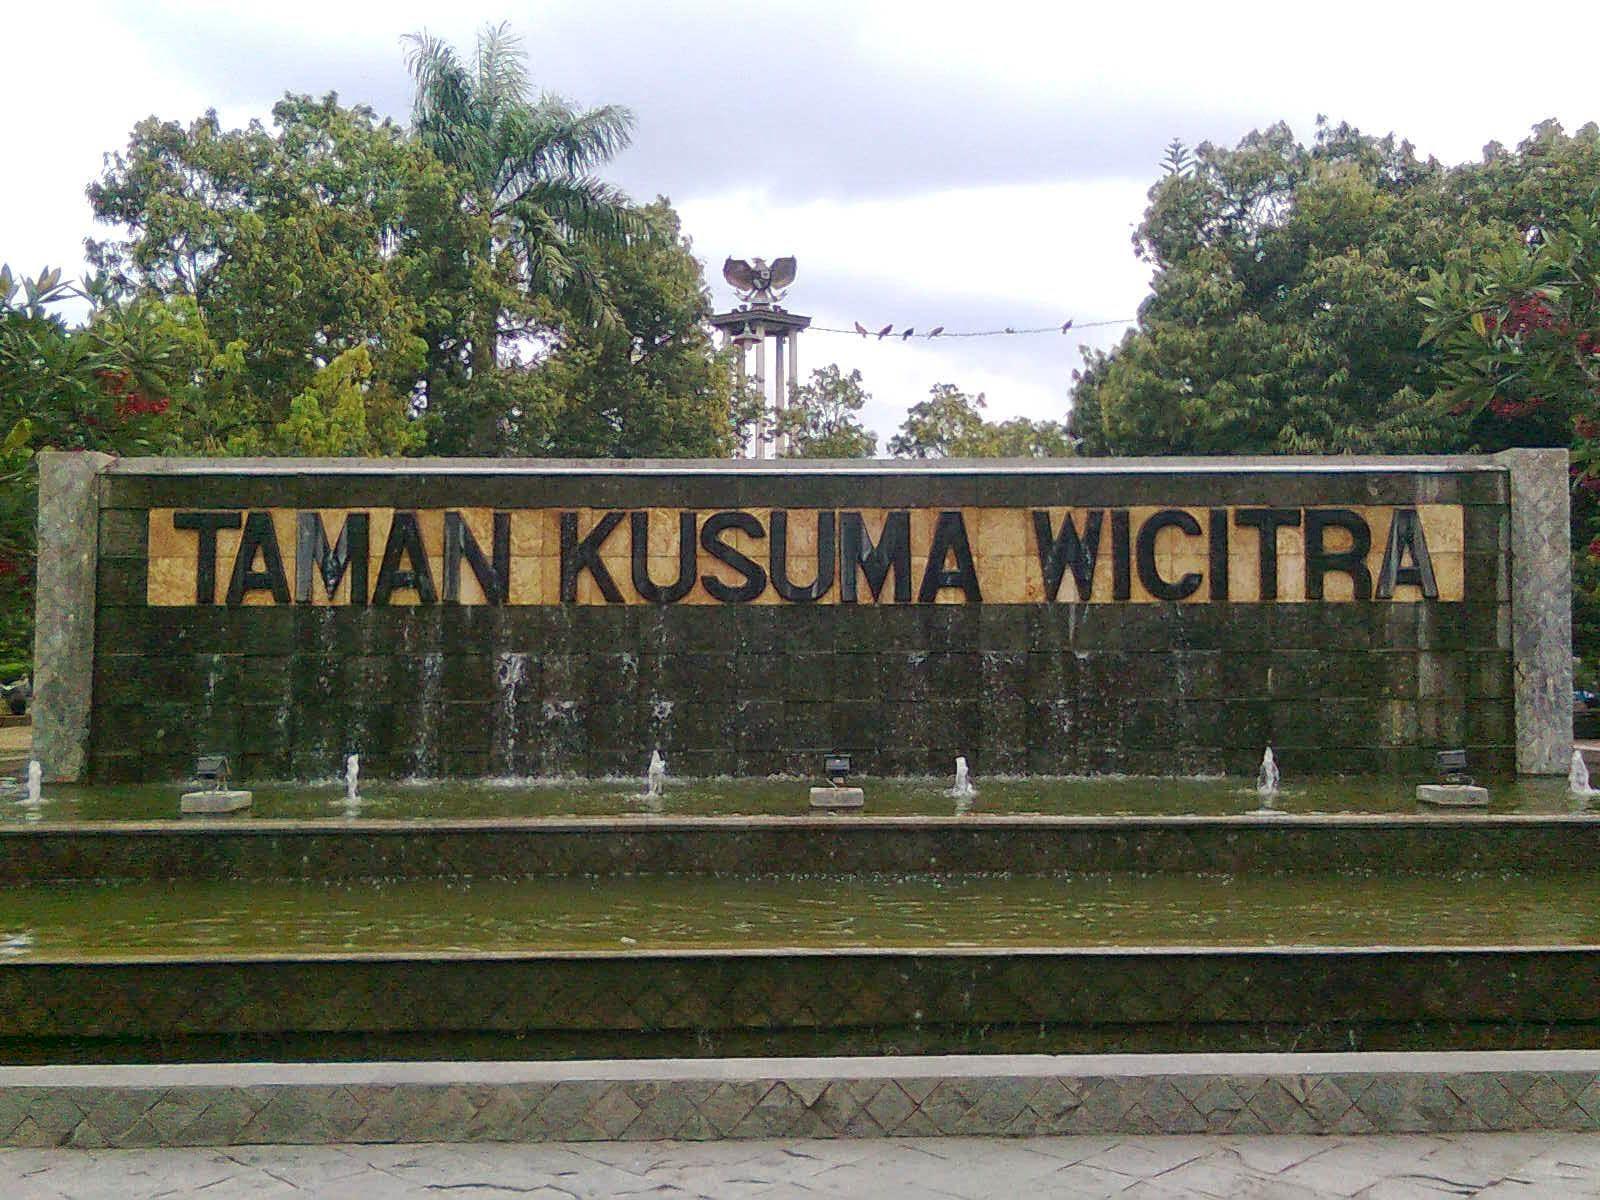 Pesona Kota Tulungagung Jawa Timur Taman Alon Robi Namanya Menjadi